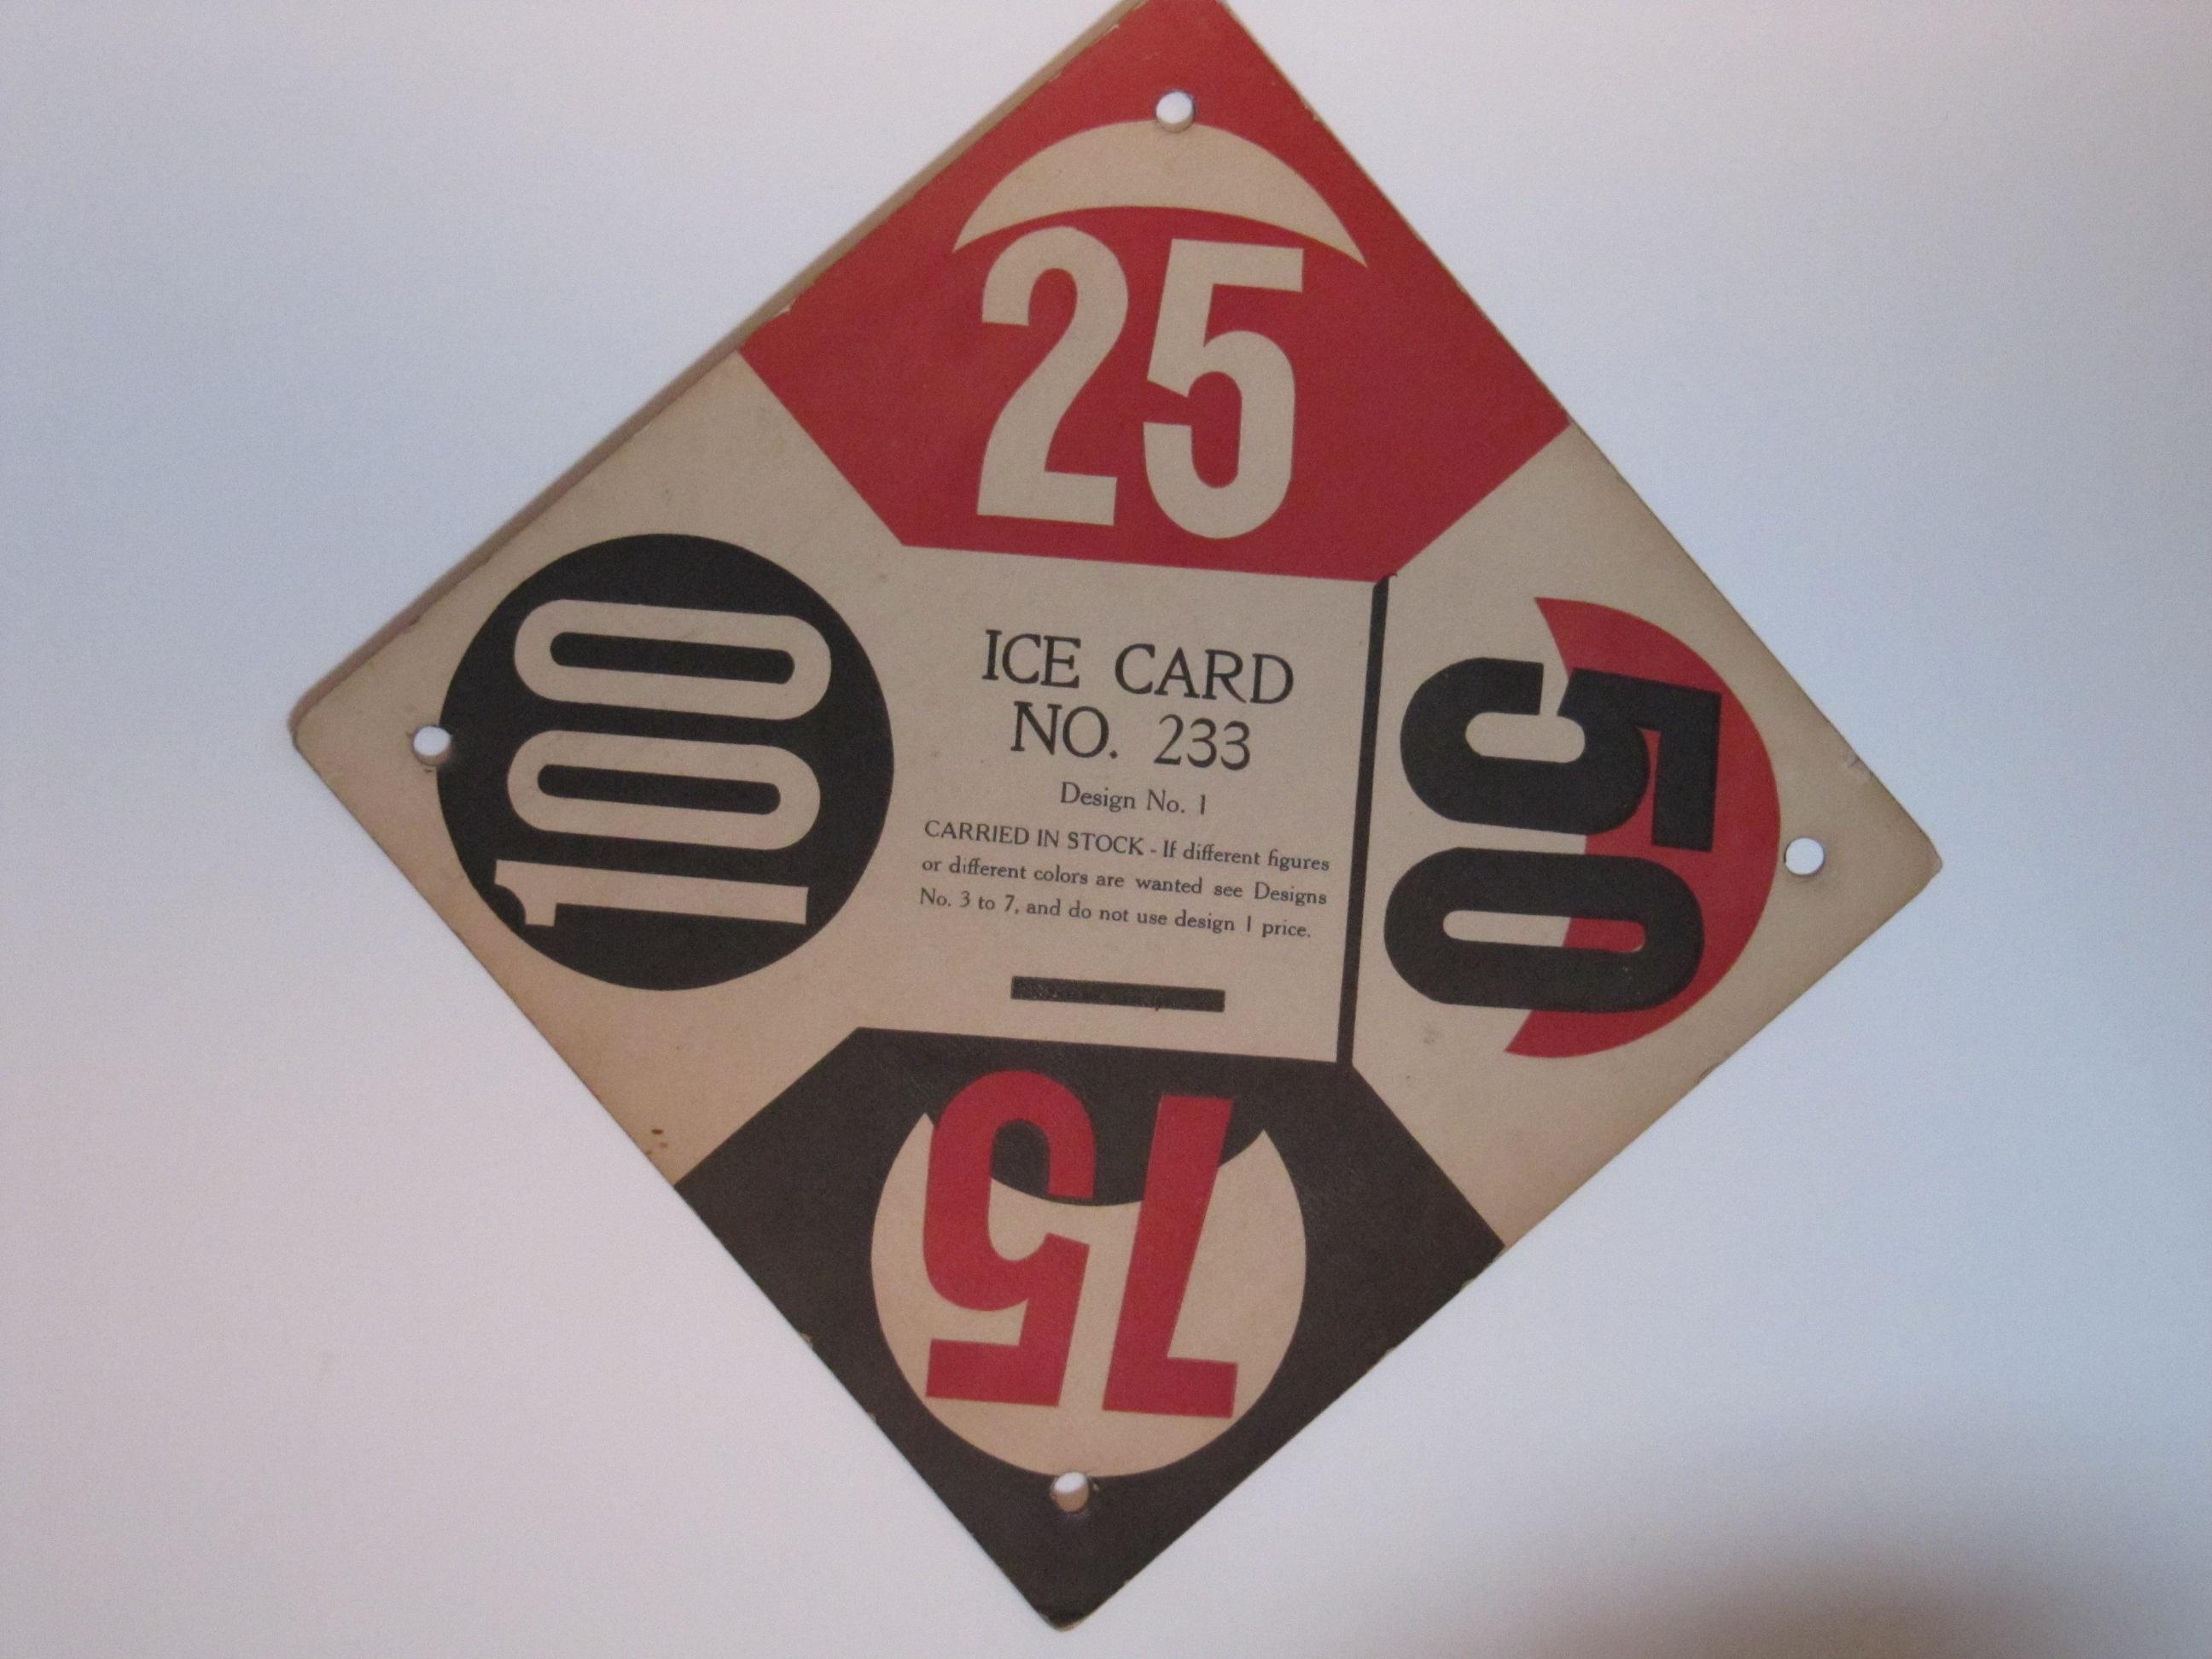 ice card no 233